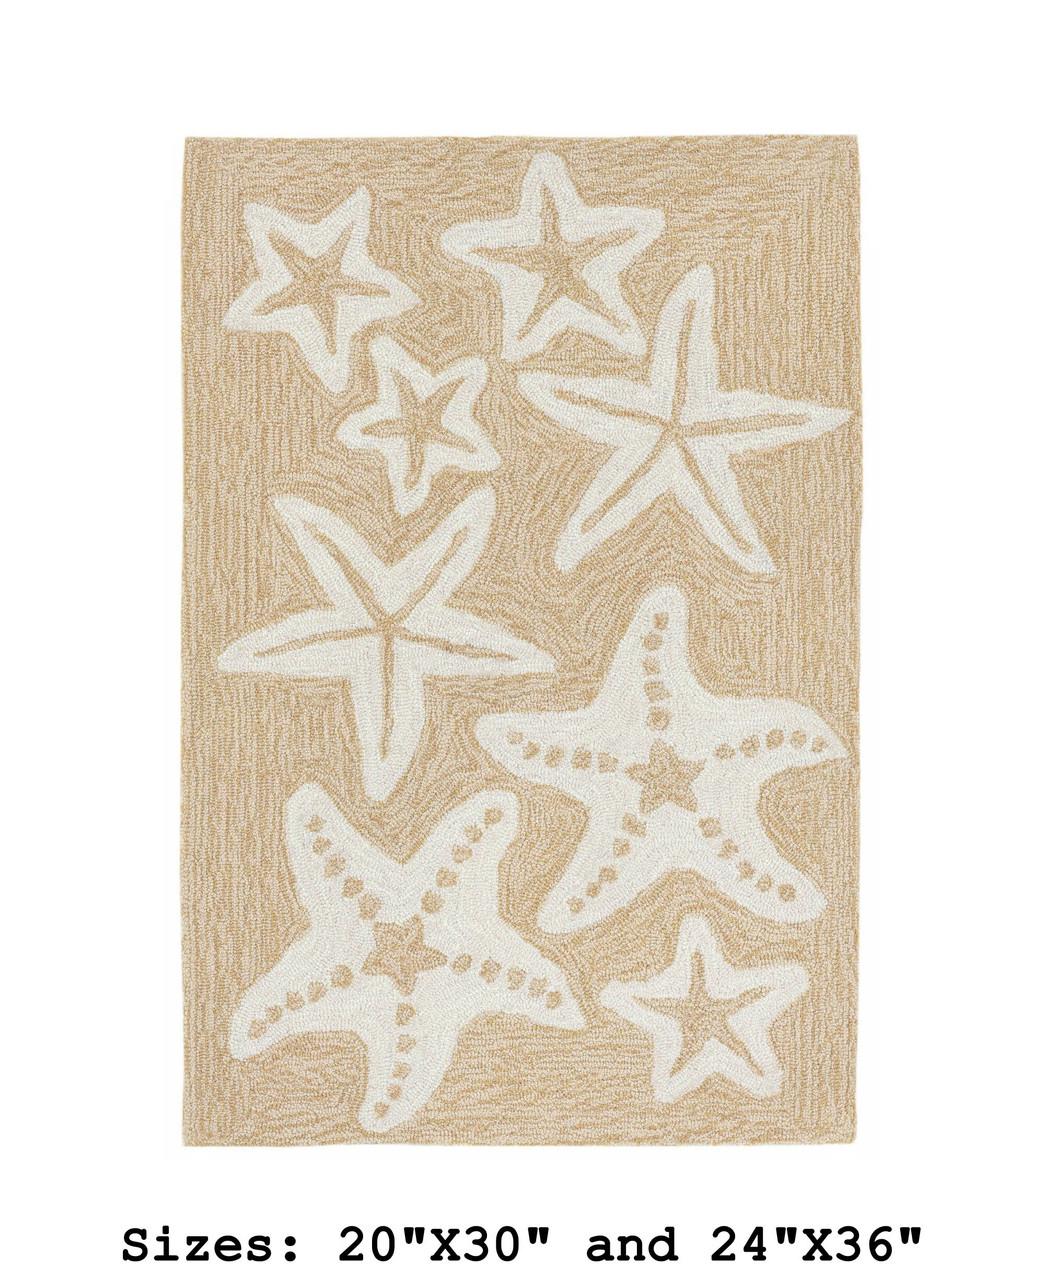 Neutral Capri Starfish Indoor/Outdoor Rug - Small Rectangle